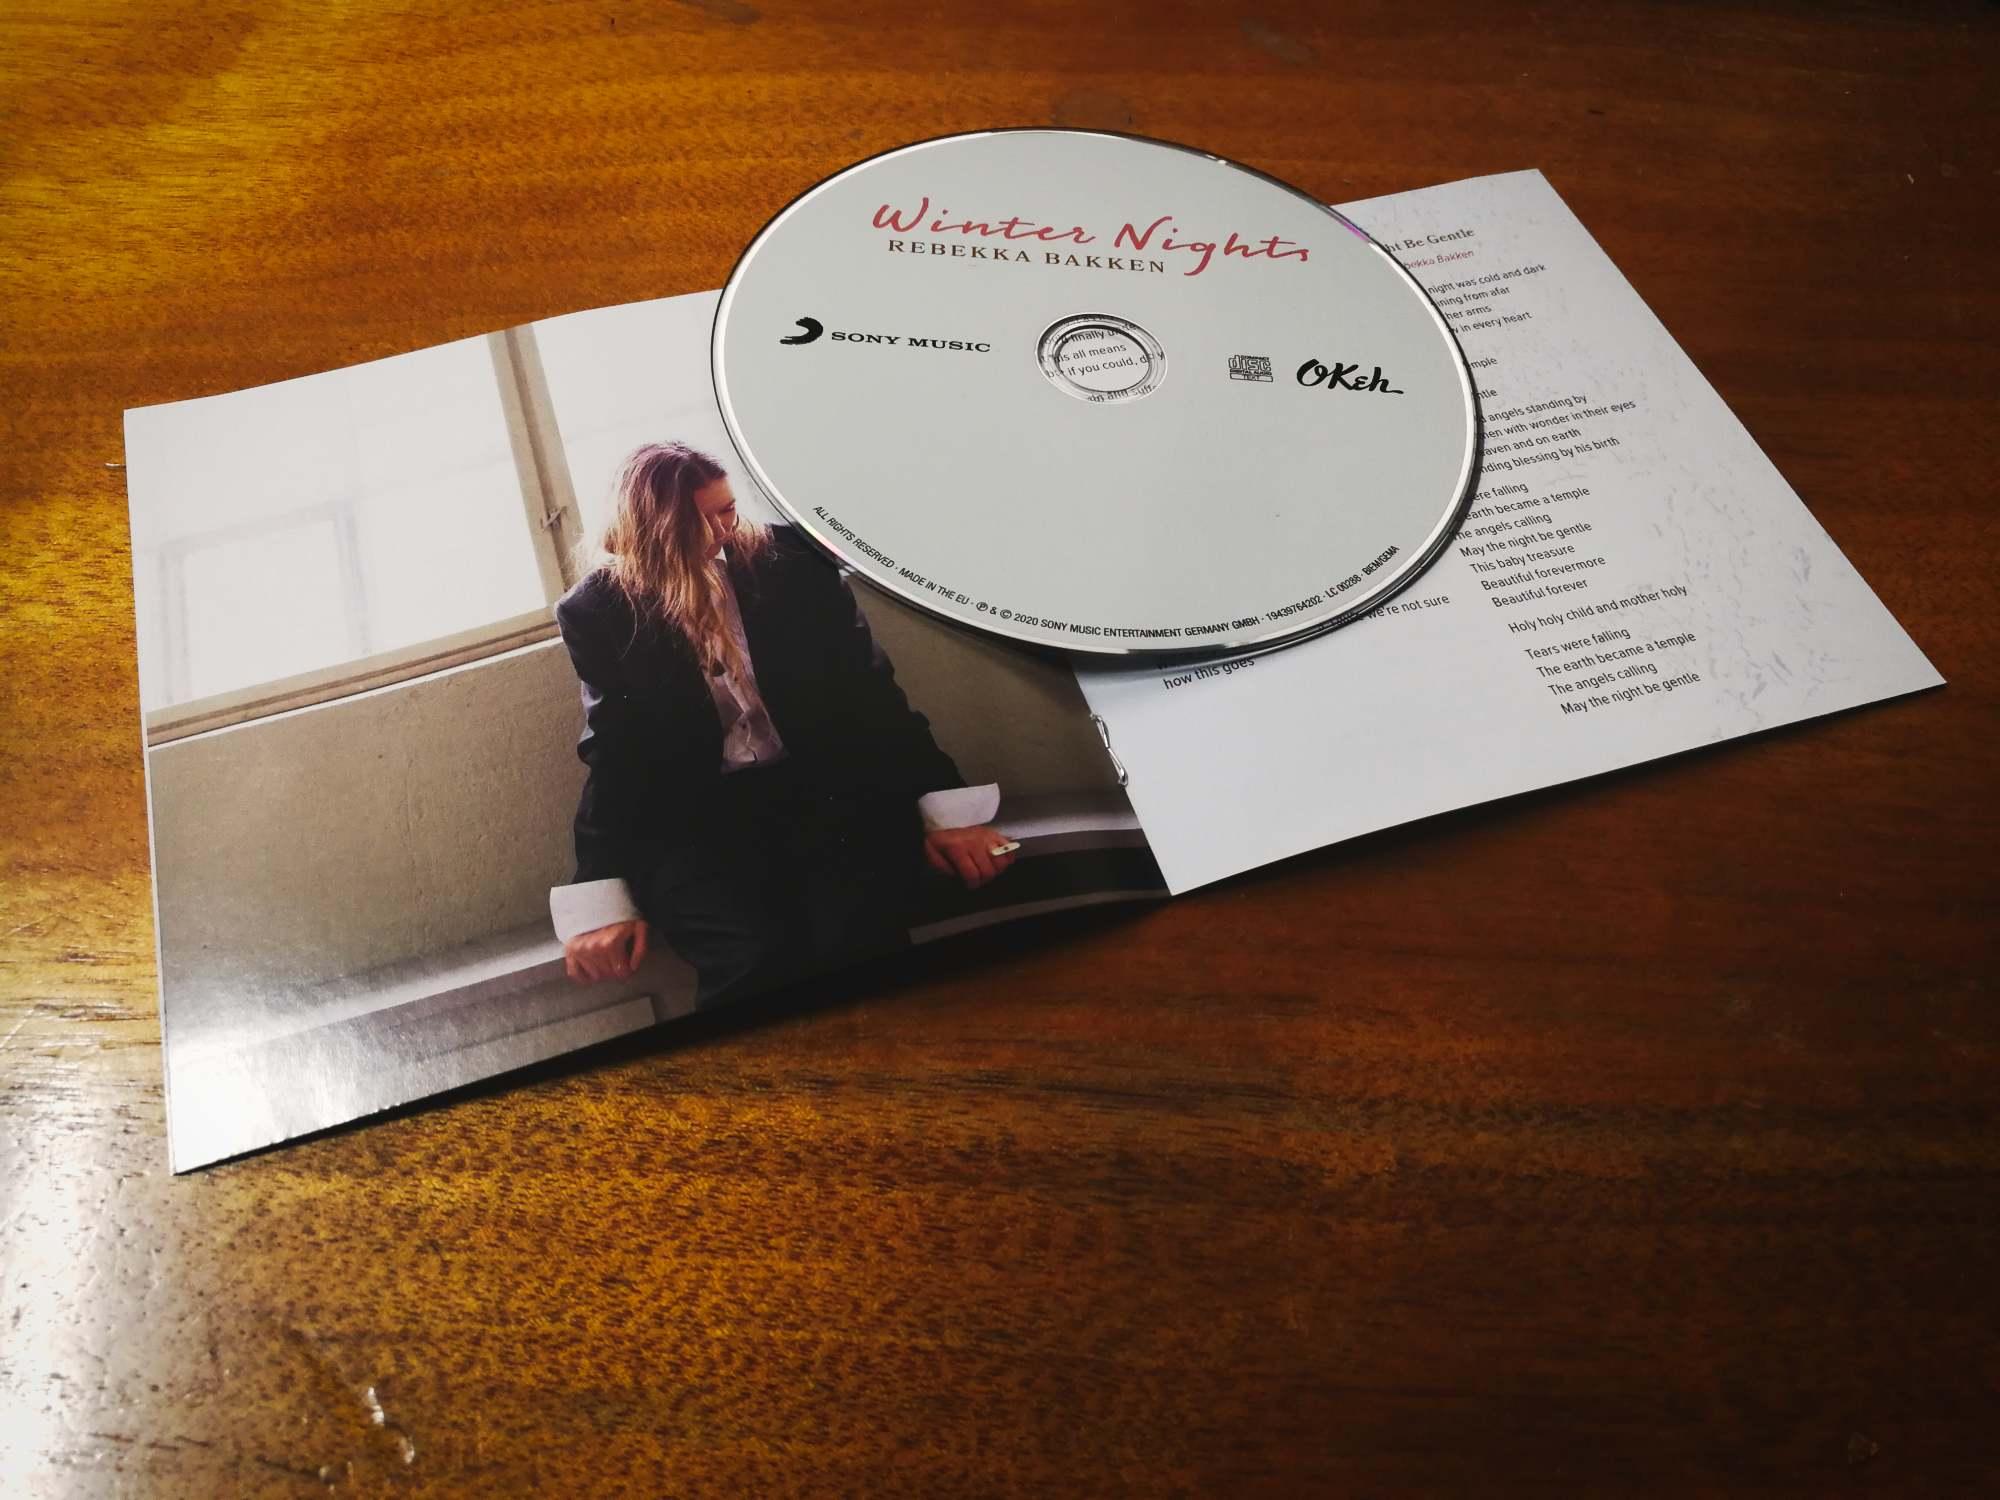 Rebekka Bakken Winter Nights CD Review